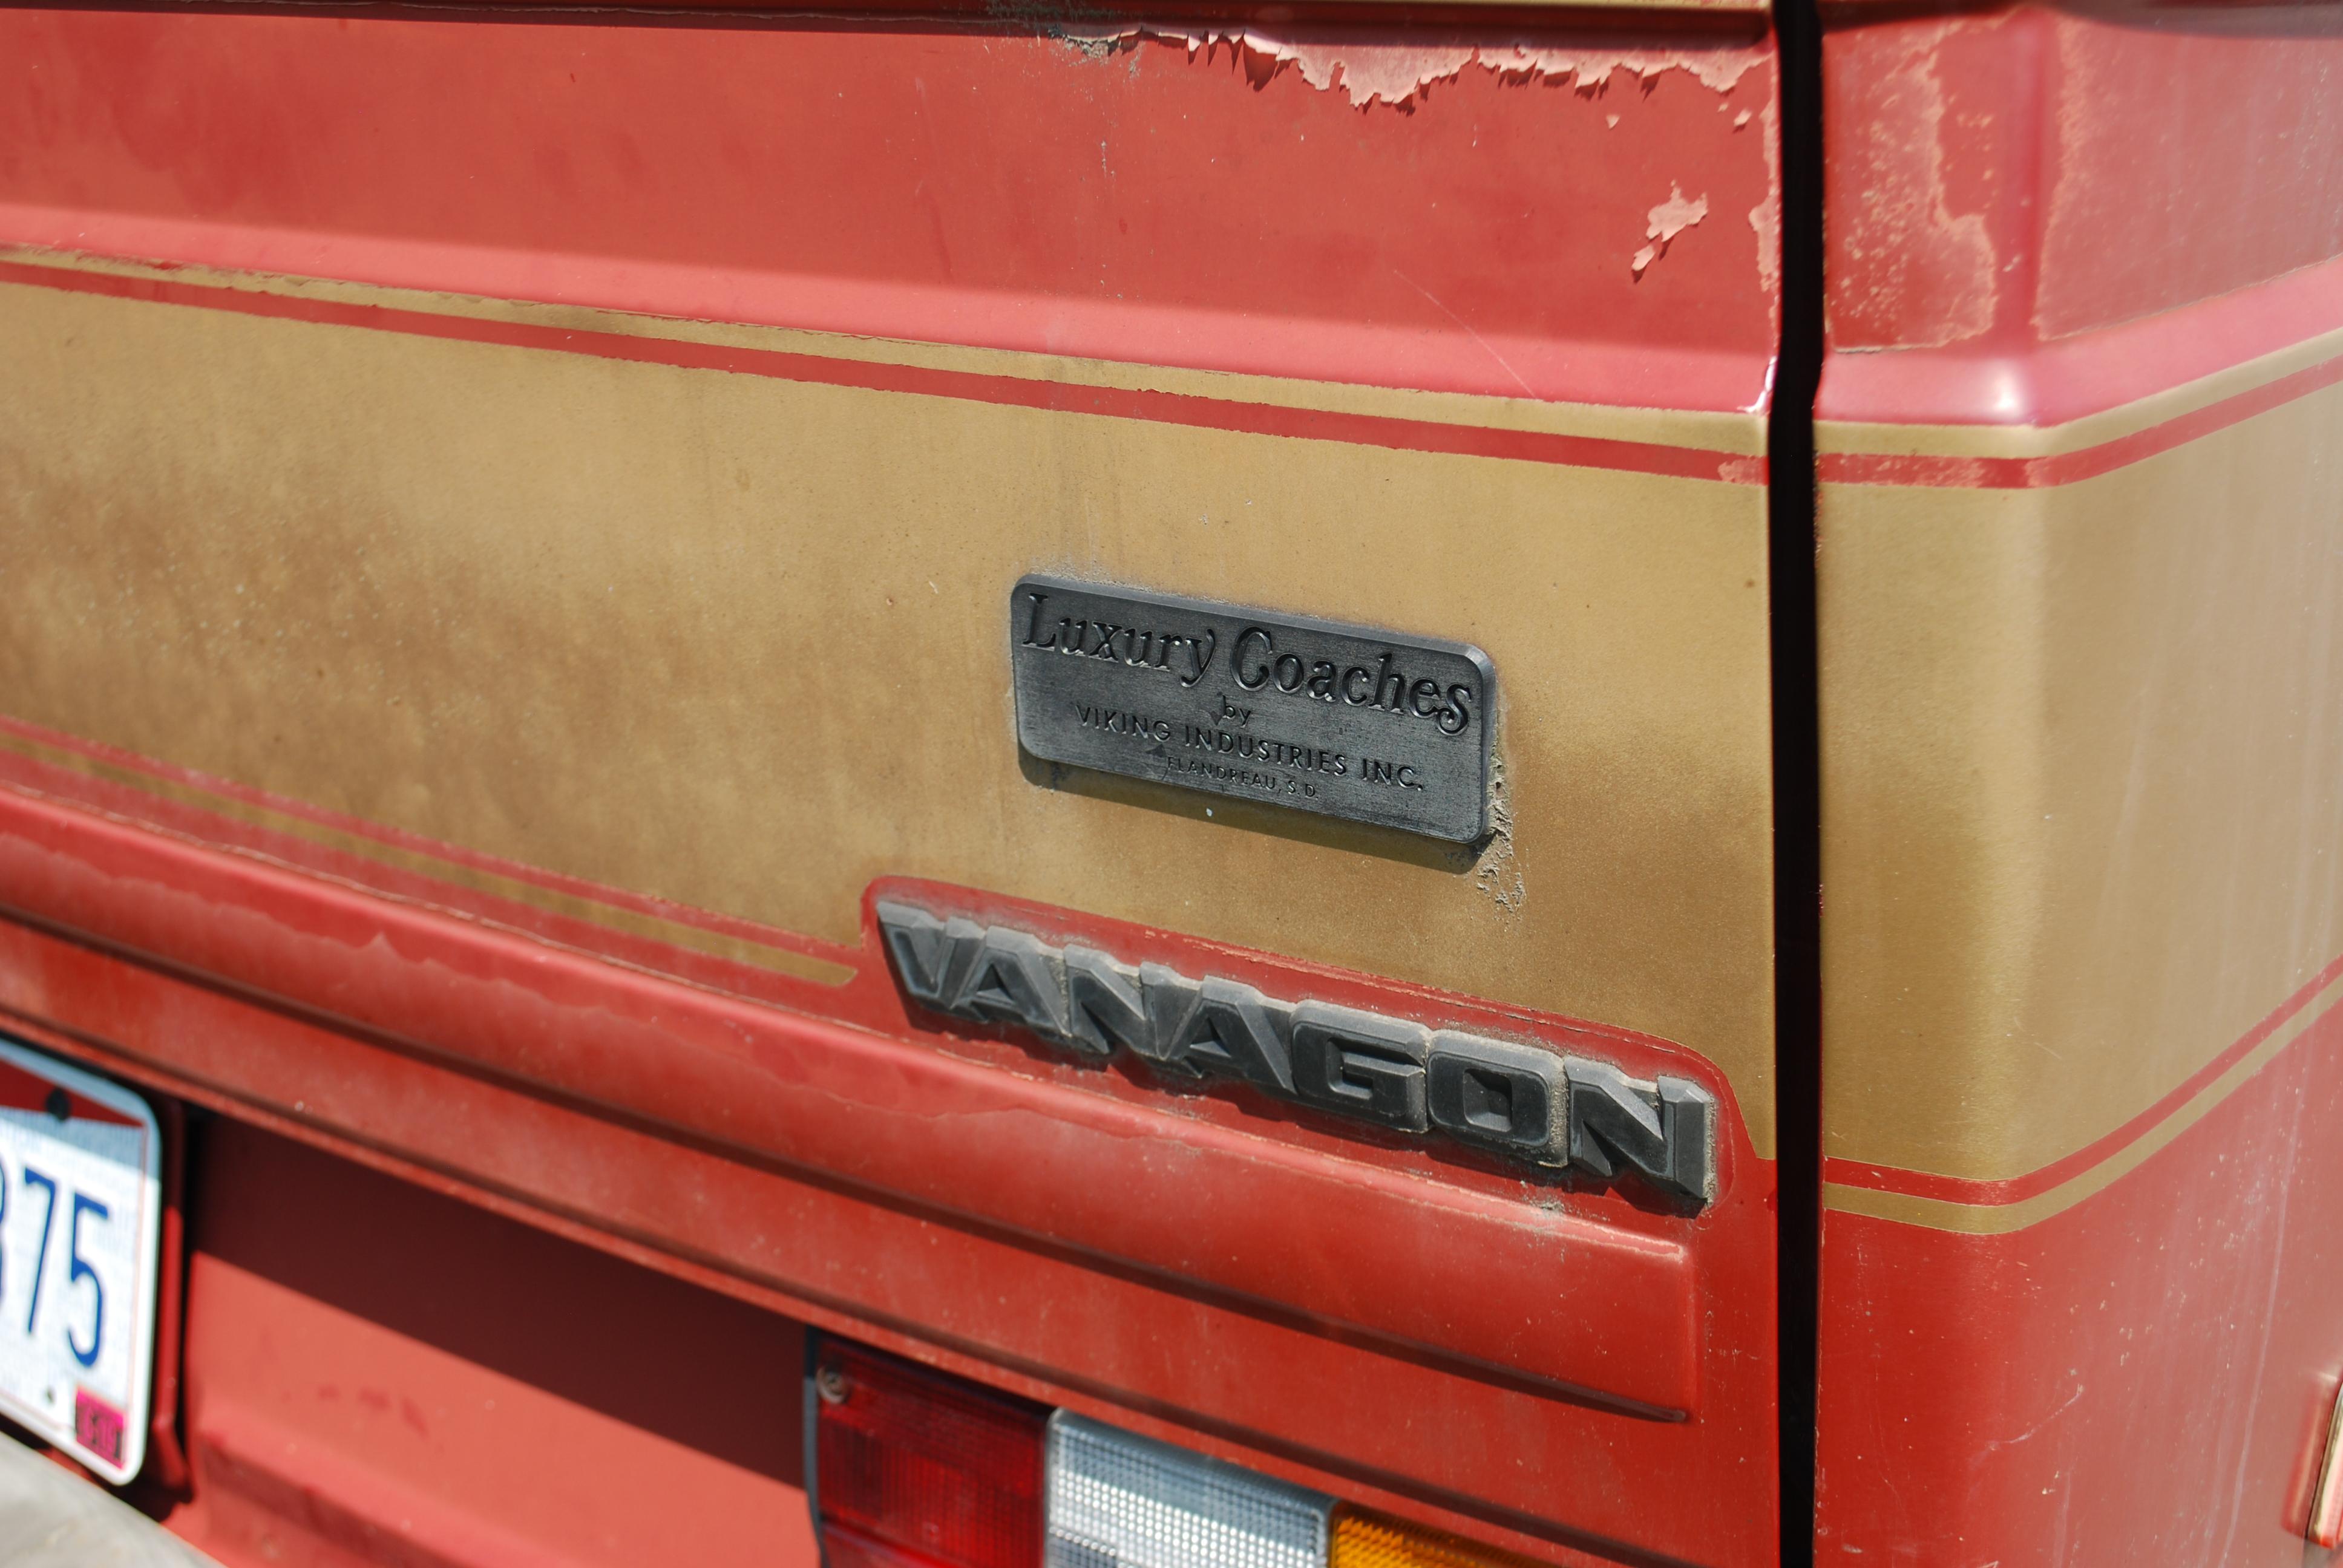 McLaren570SvsAudiR8V10Plus Comparison00002 1200x550 photo